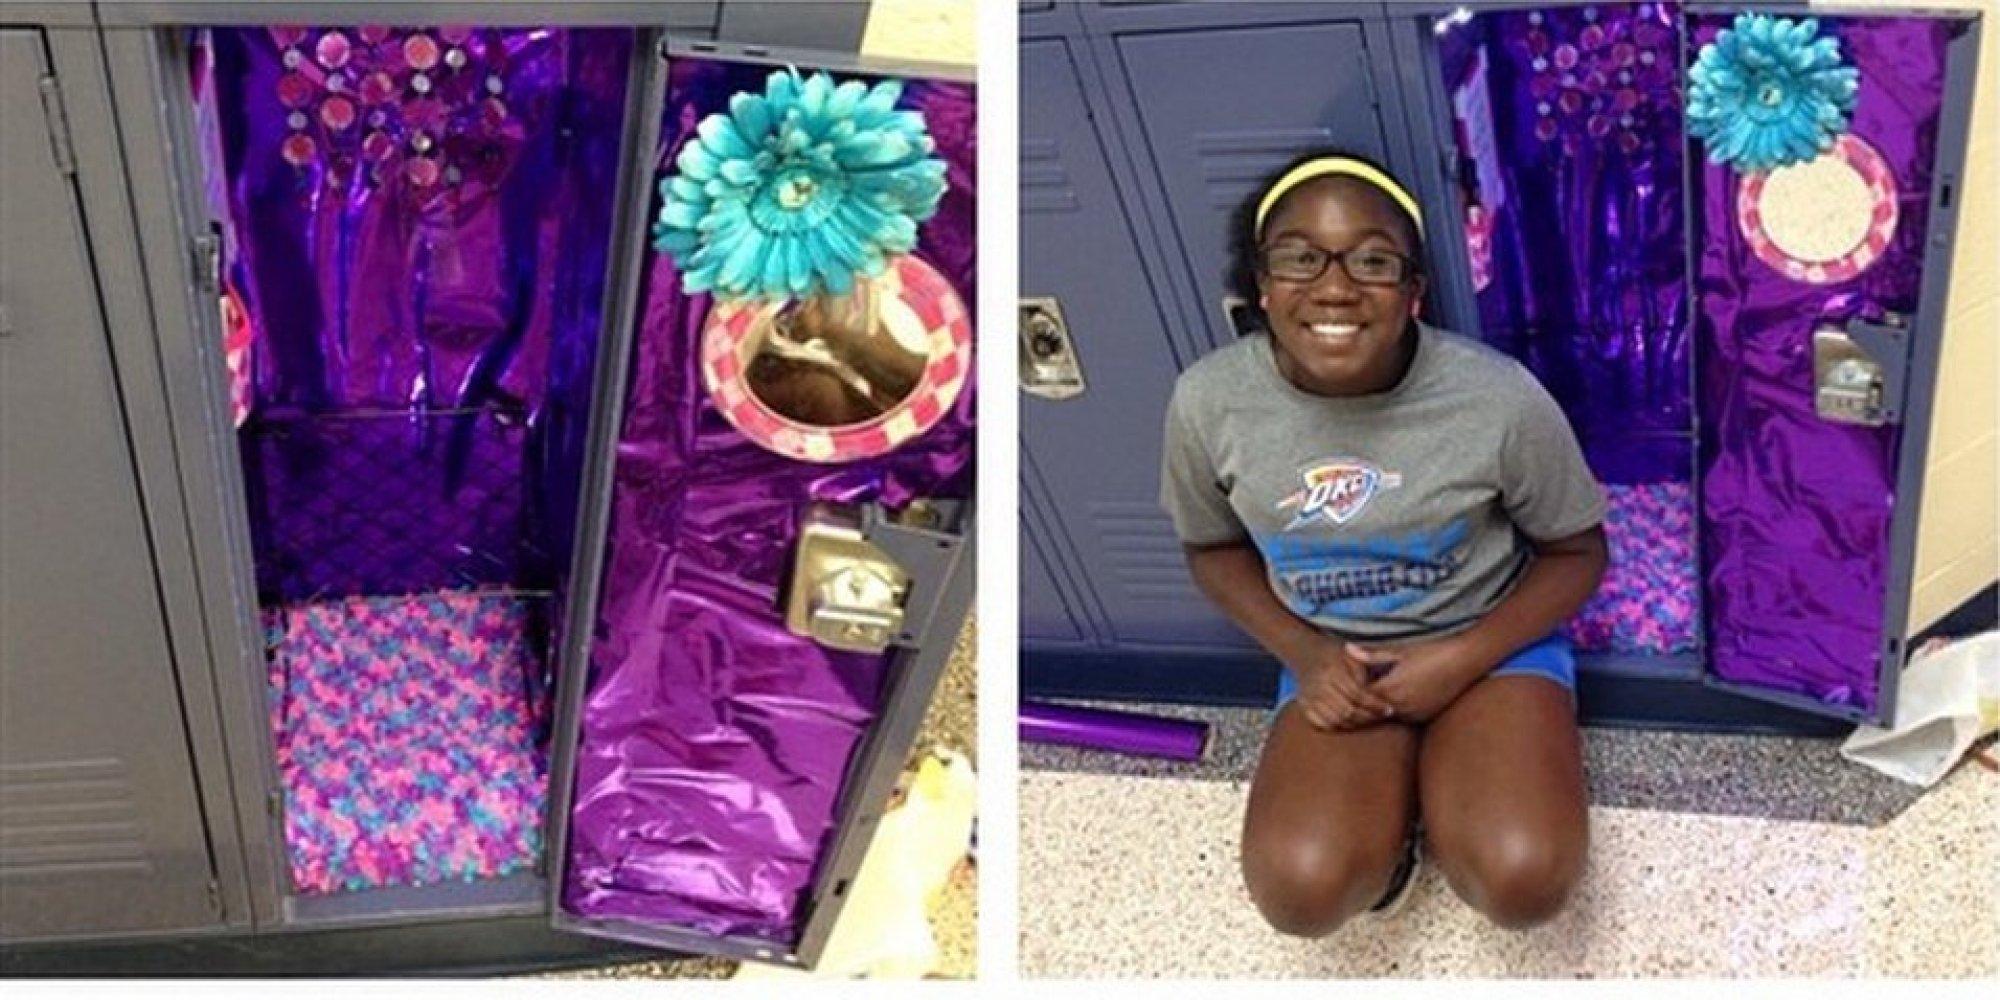 DIY Ways To Take Your Locker To The Next Level HuffPost - Cute diy school locker ideas